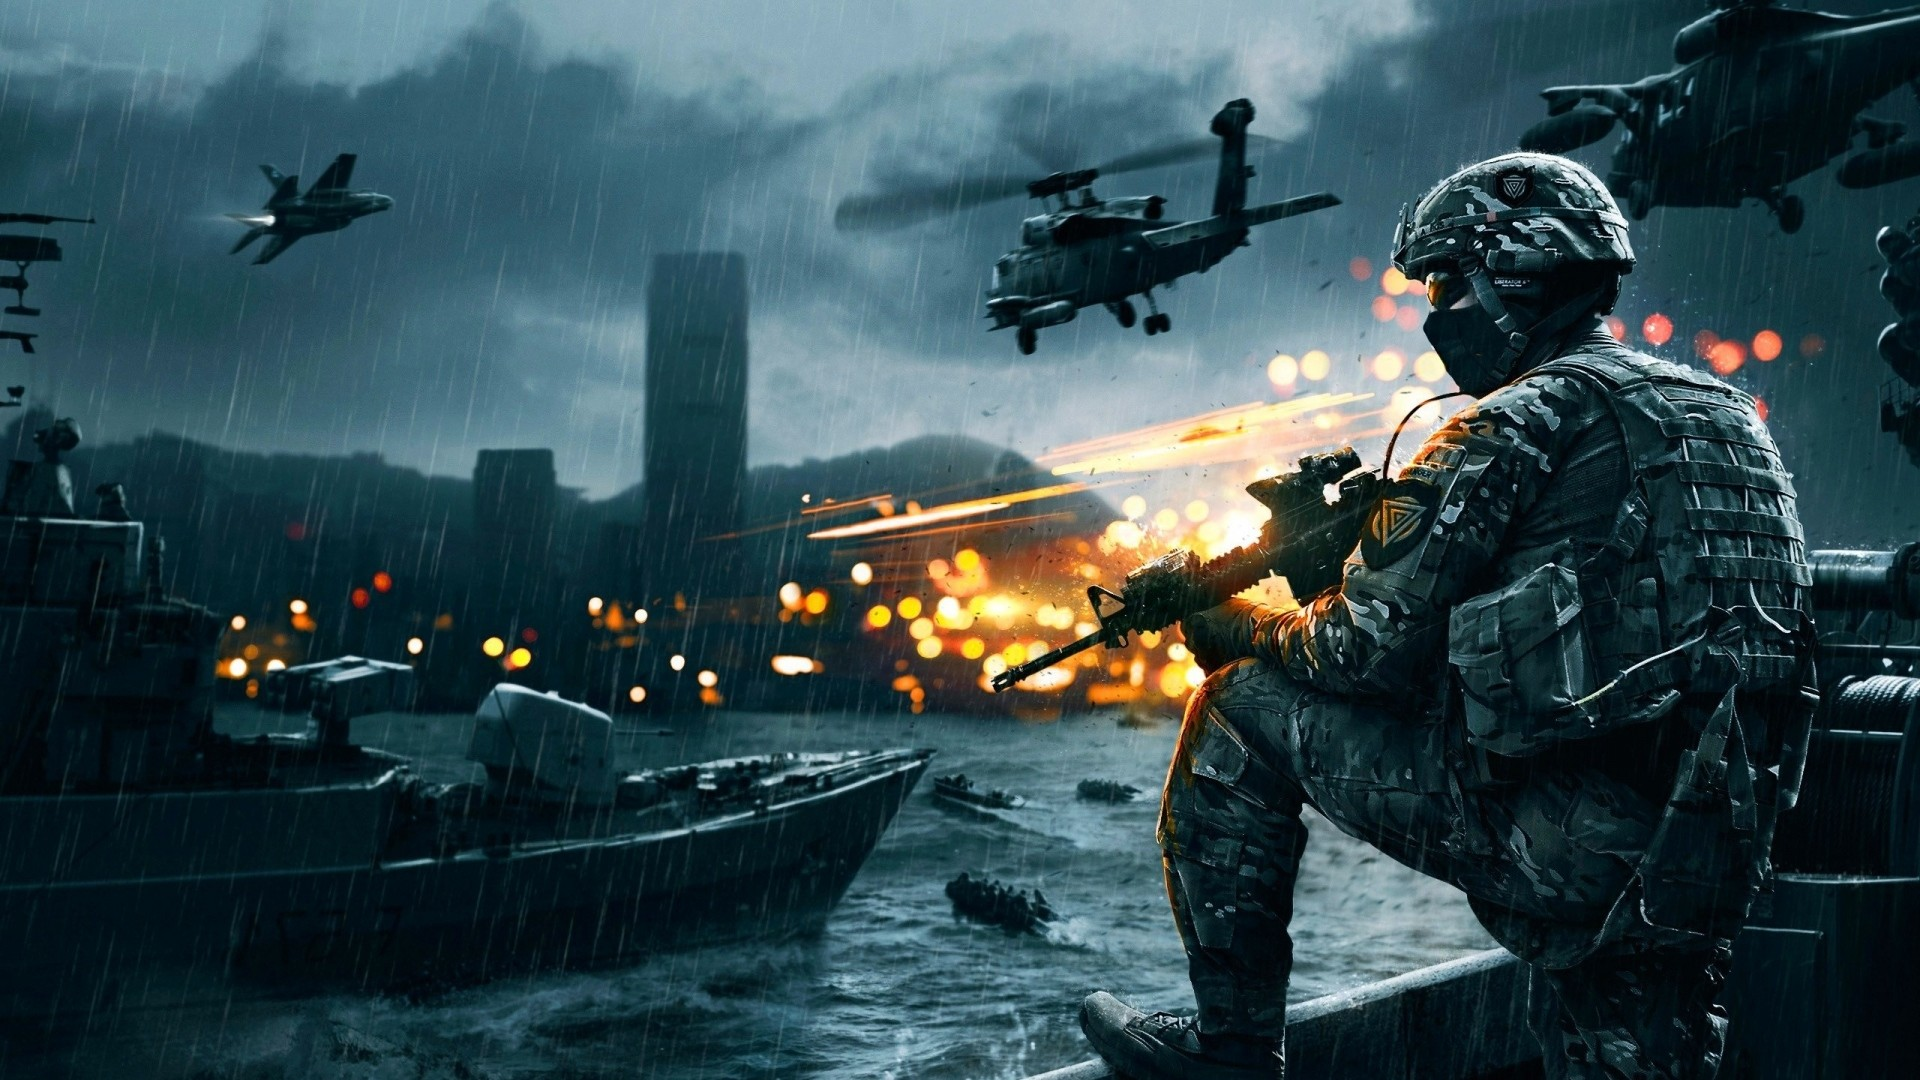 … Background Full HD 1080p. Wallpaper battlefield 4, game, ea  digital illusions ce